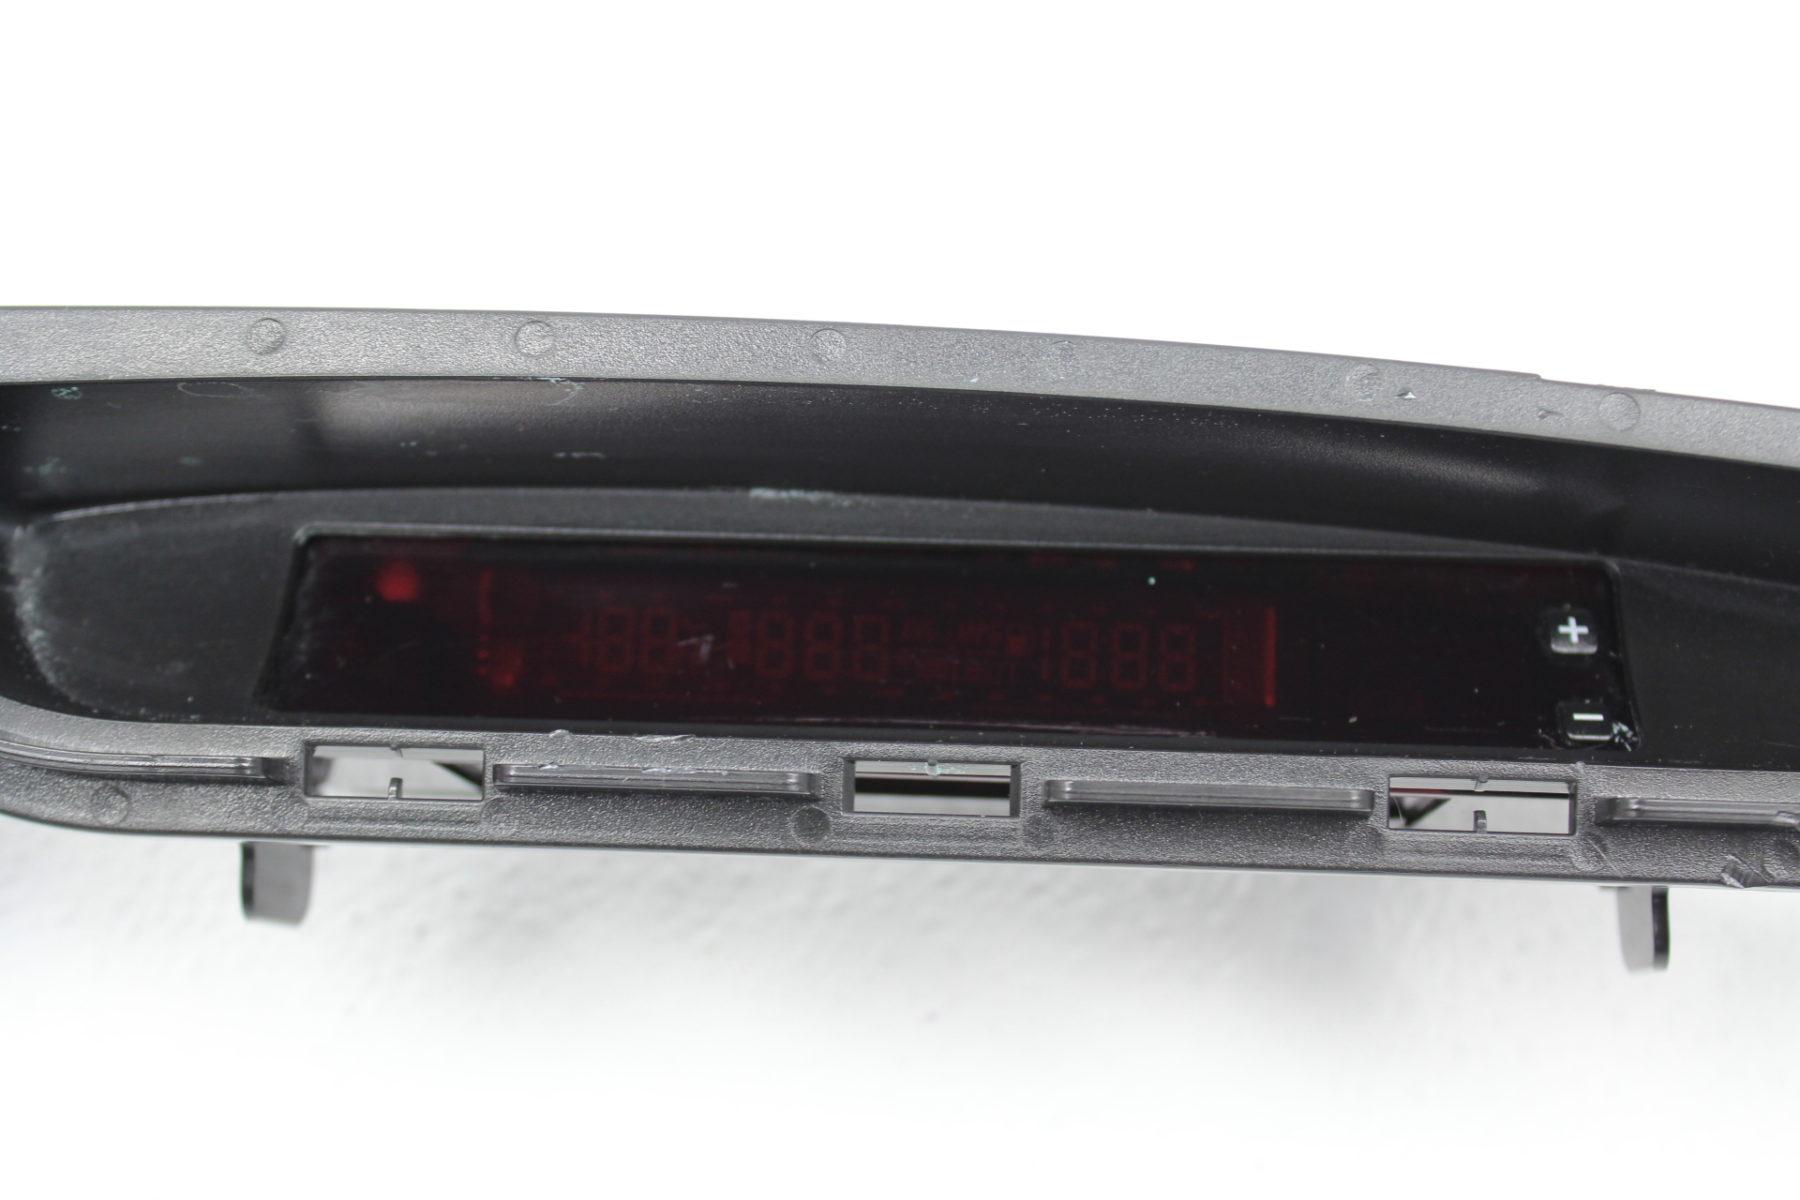 2002 2003 2004 2005 Subaru Impreza WRX STI Rs Dash Clock Oem